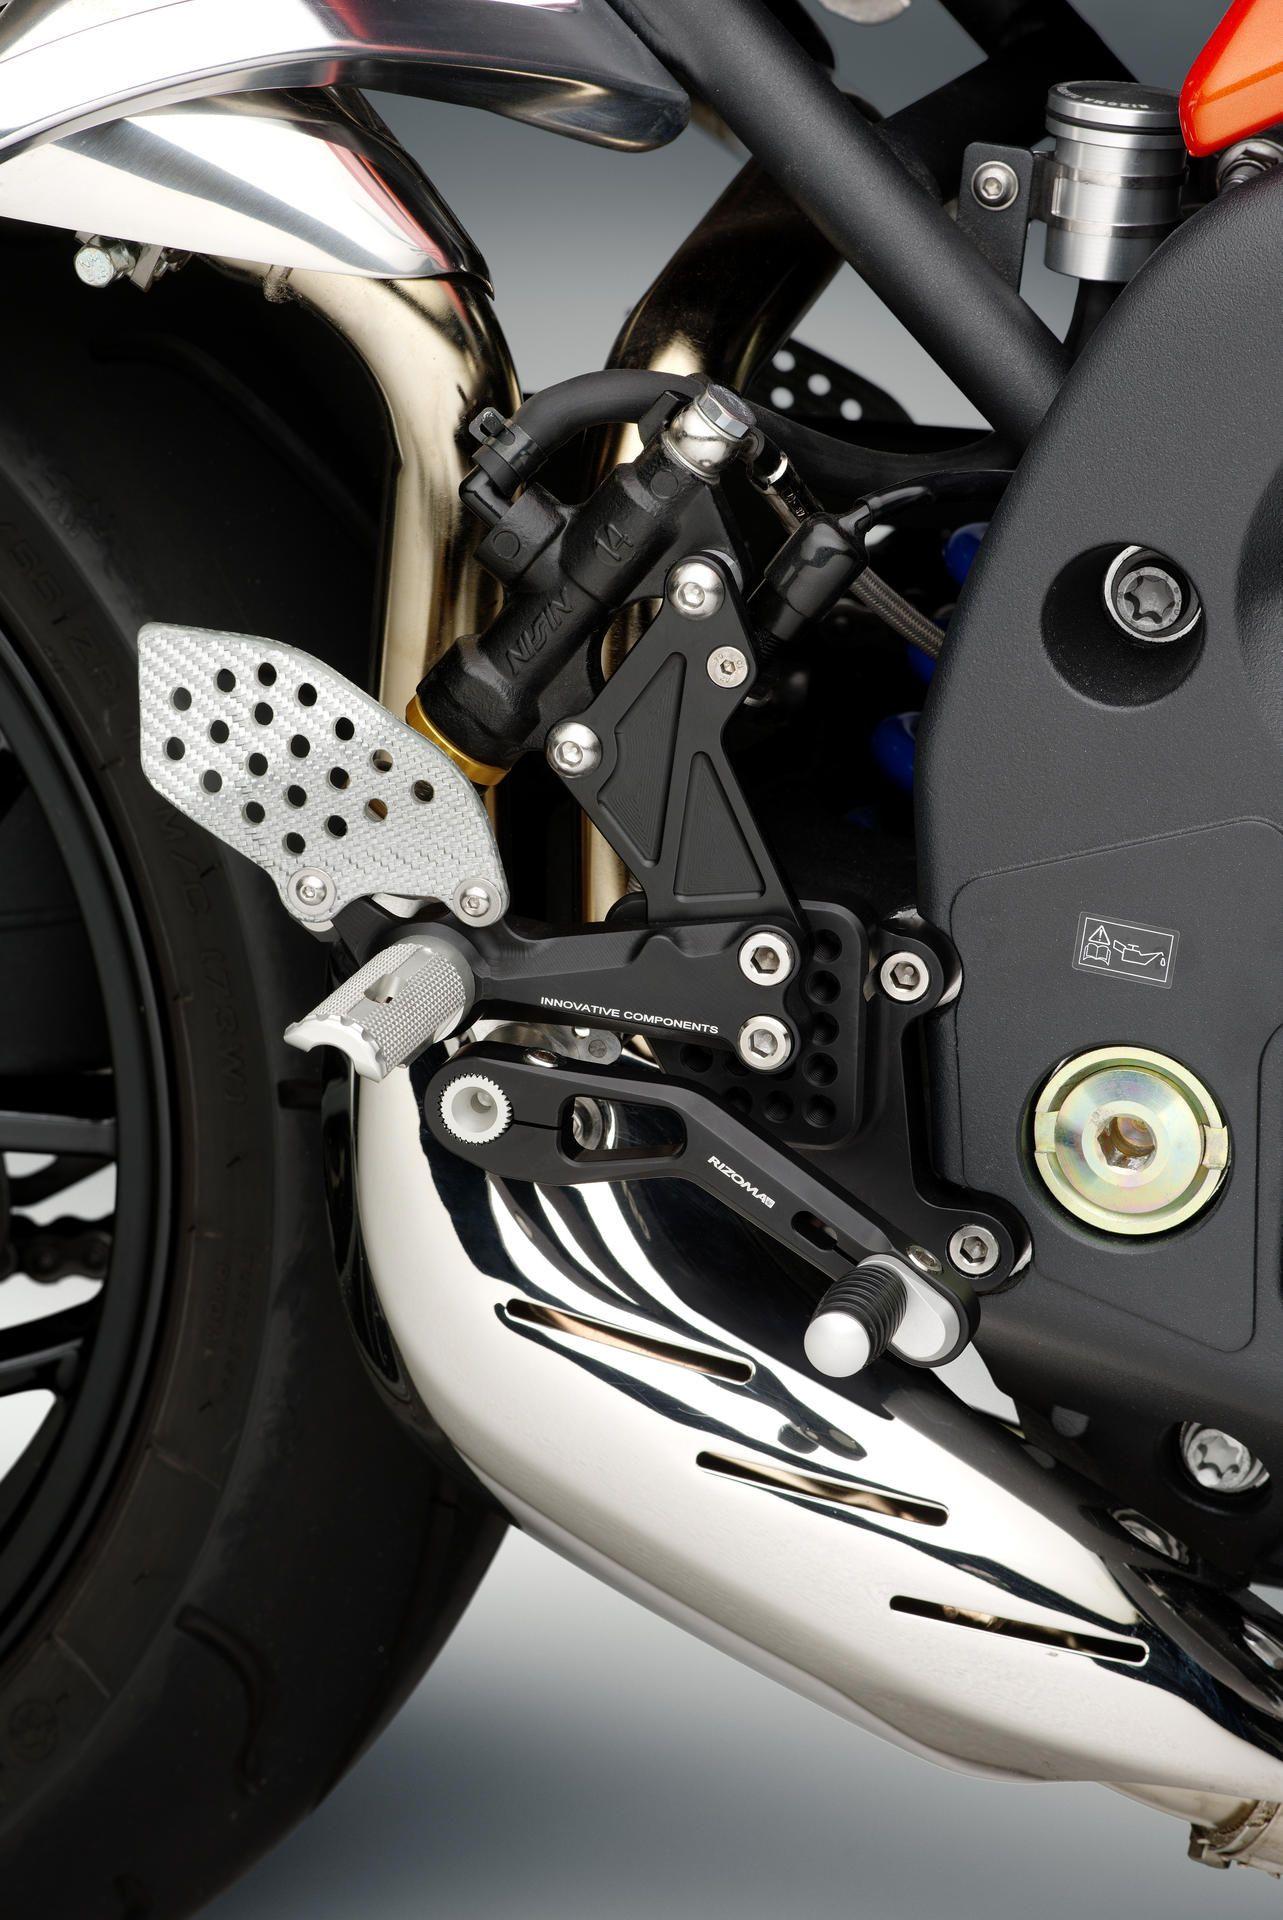 【RIZOMA】腳踏後移套件 - 「Webike-摩托百貨」